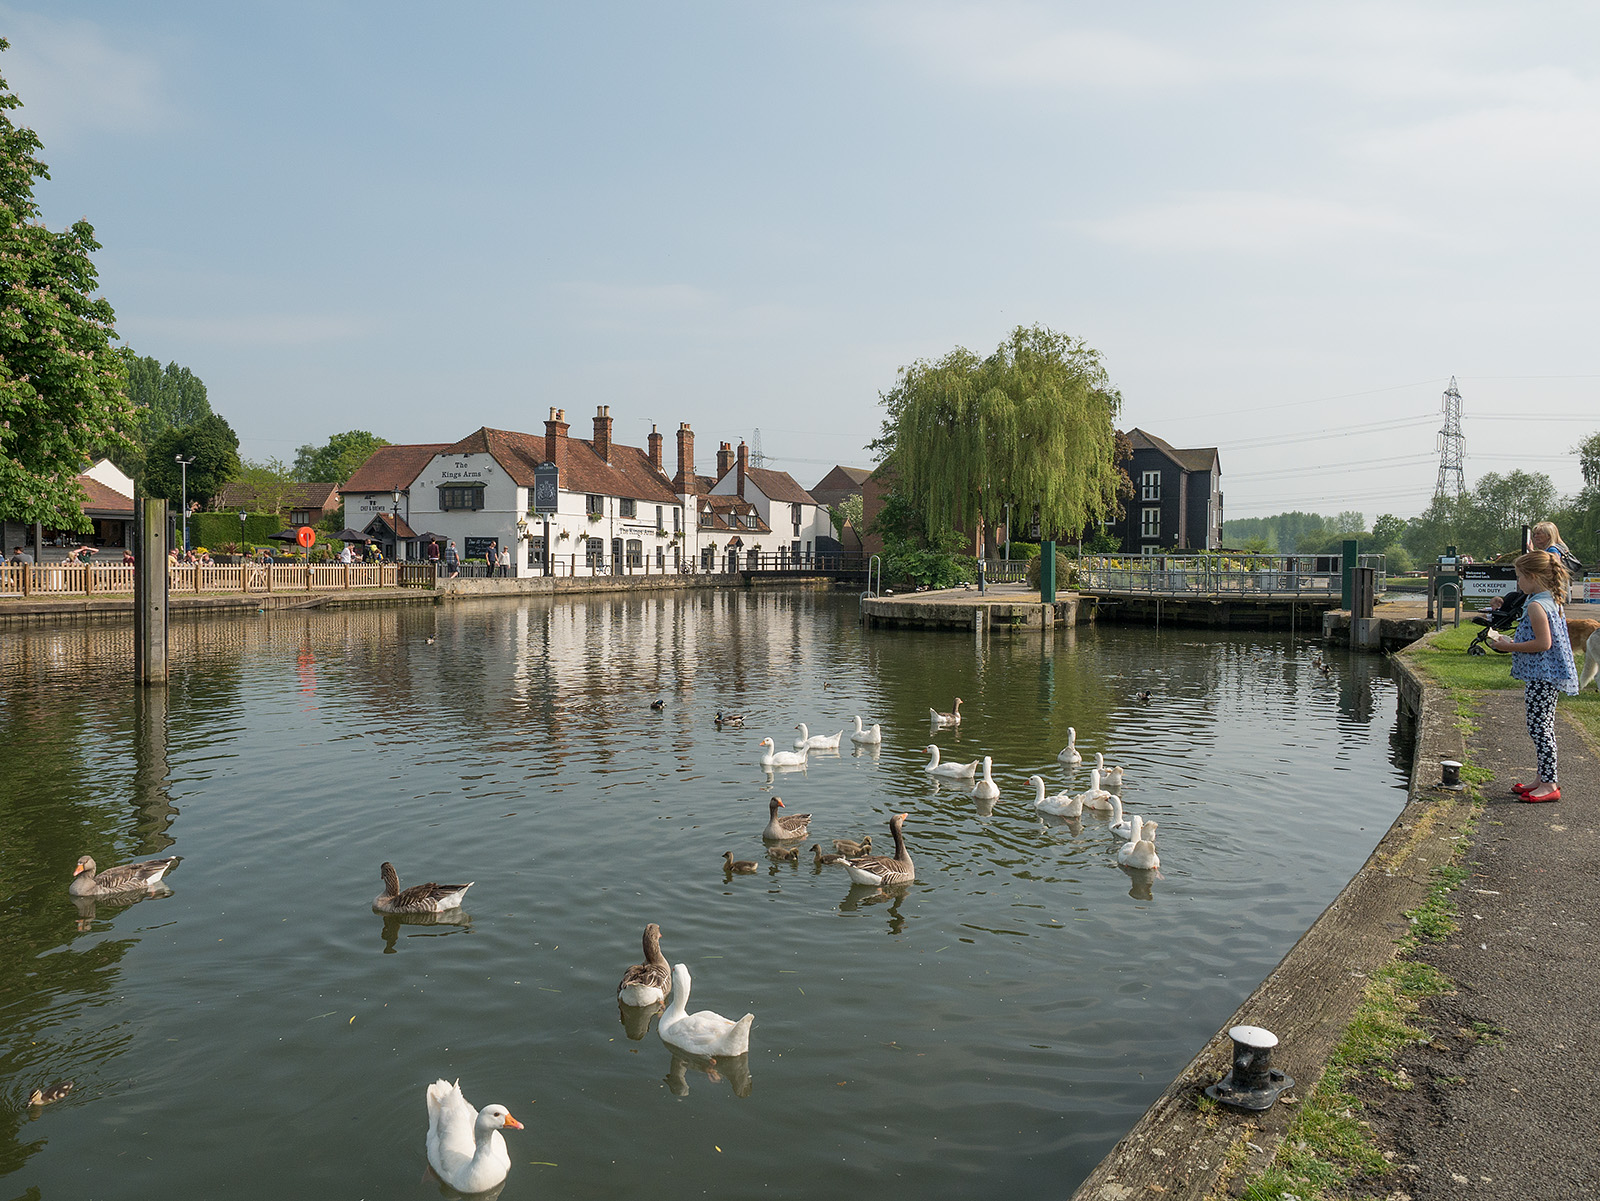 View across Sandford lock to the Kings Head pub